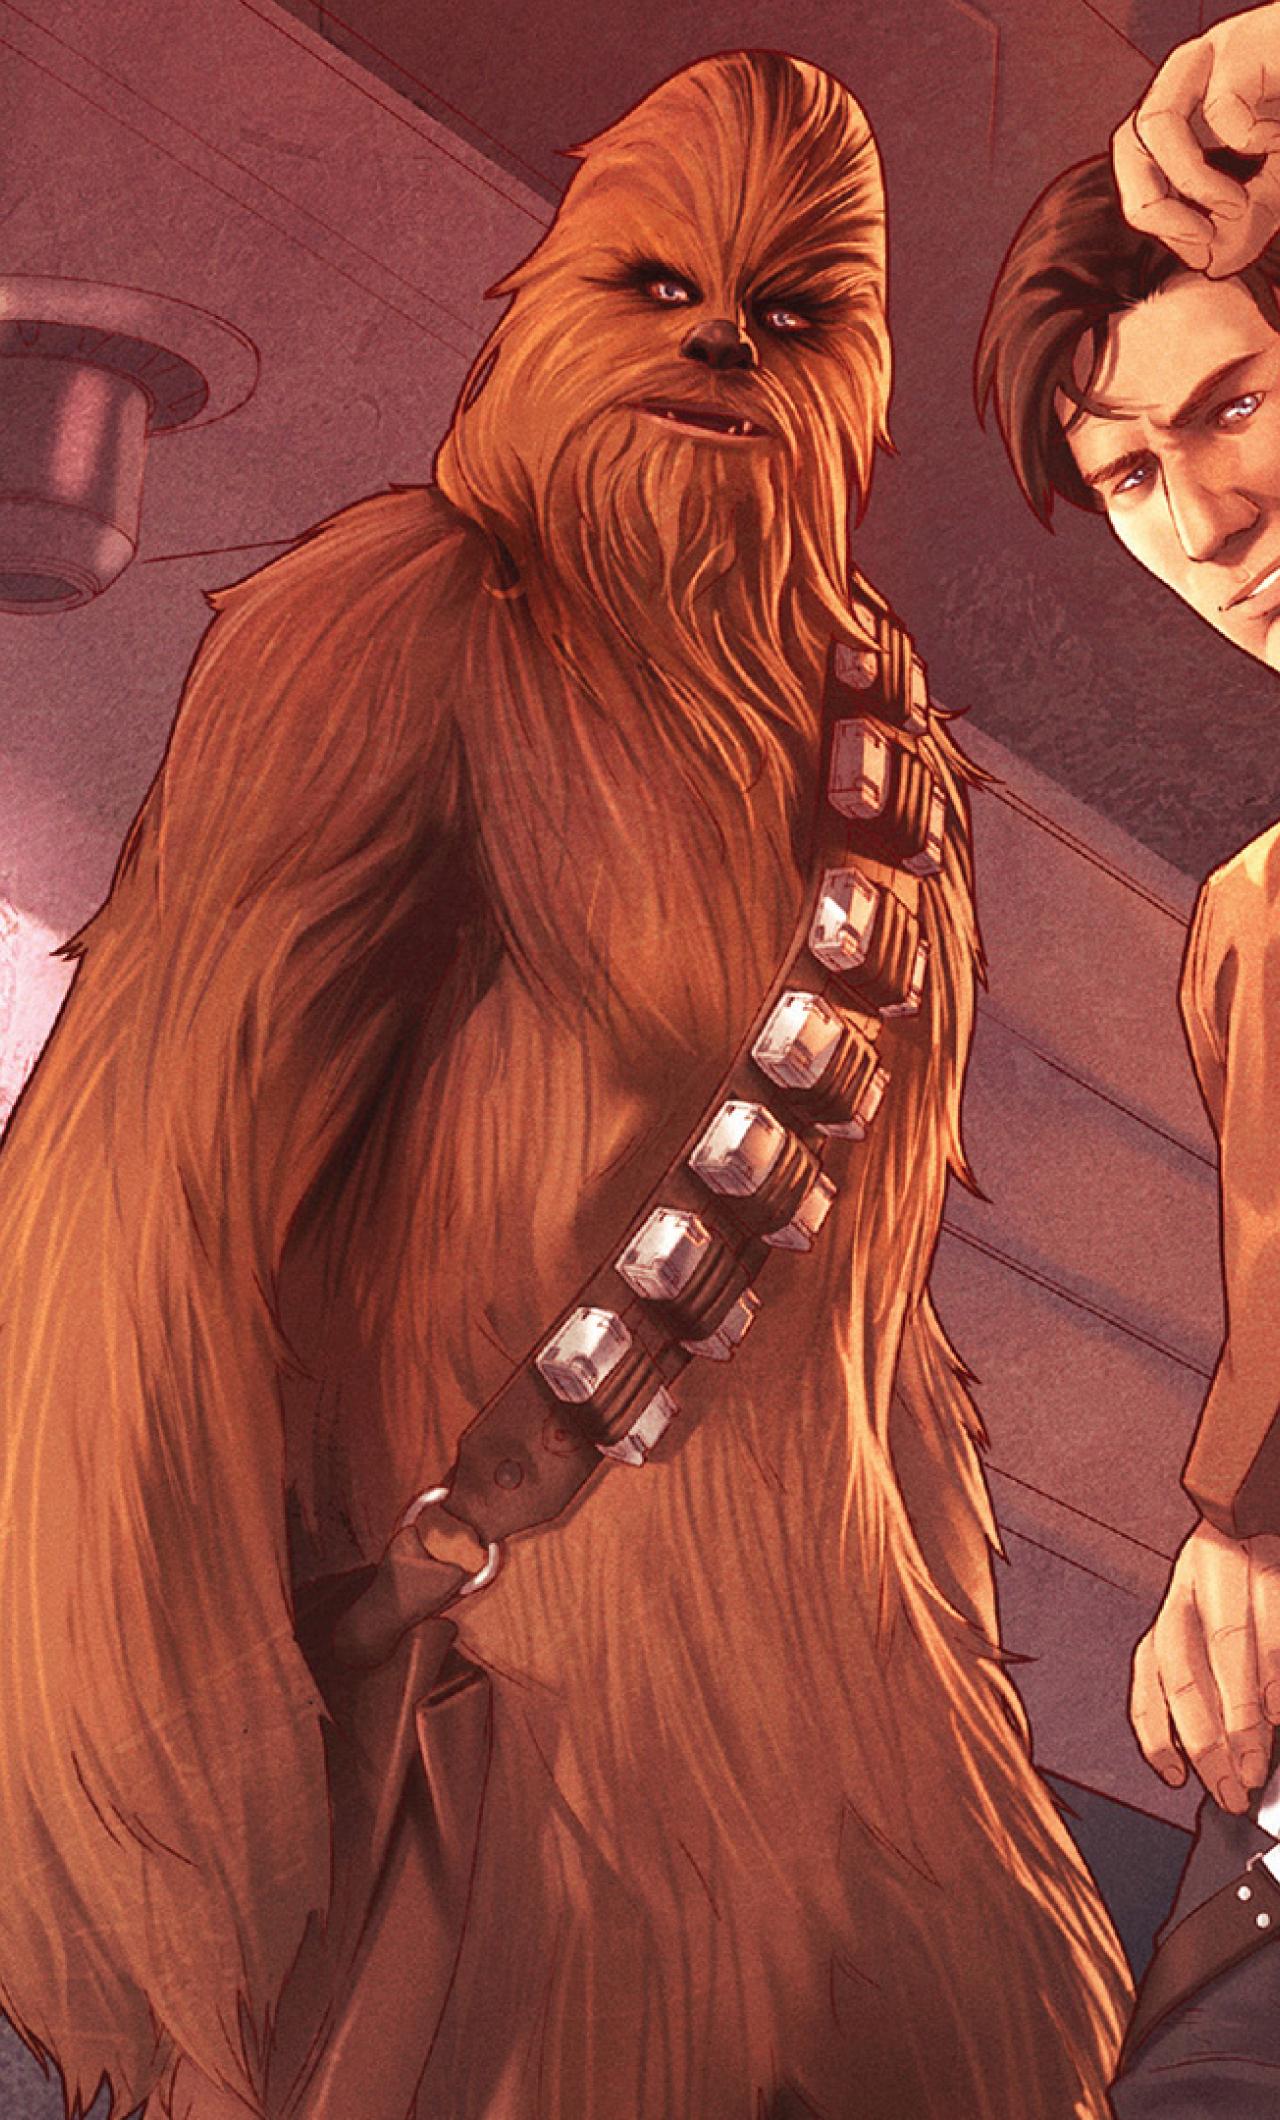 Star wars han solo and chewbacca full hd wallpaper - Han solo wallpaper ...